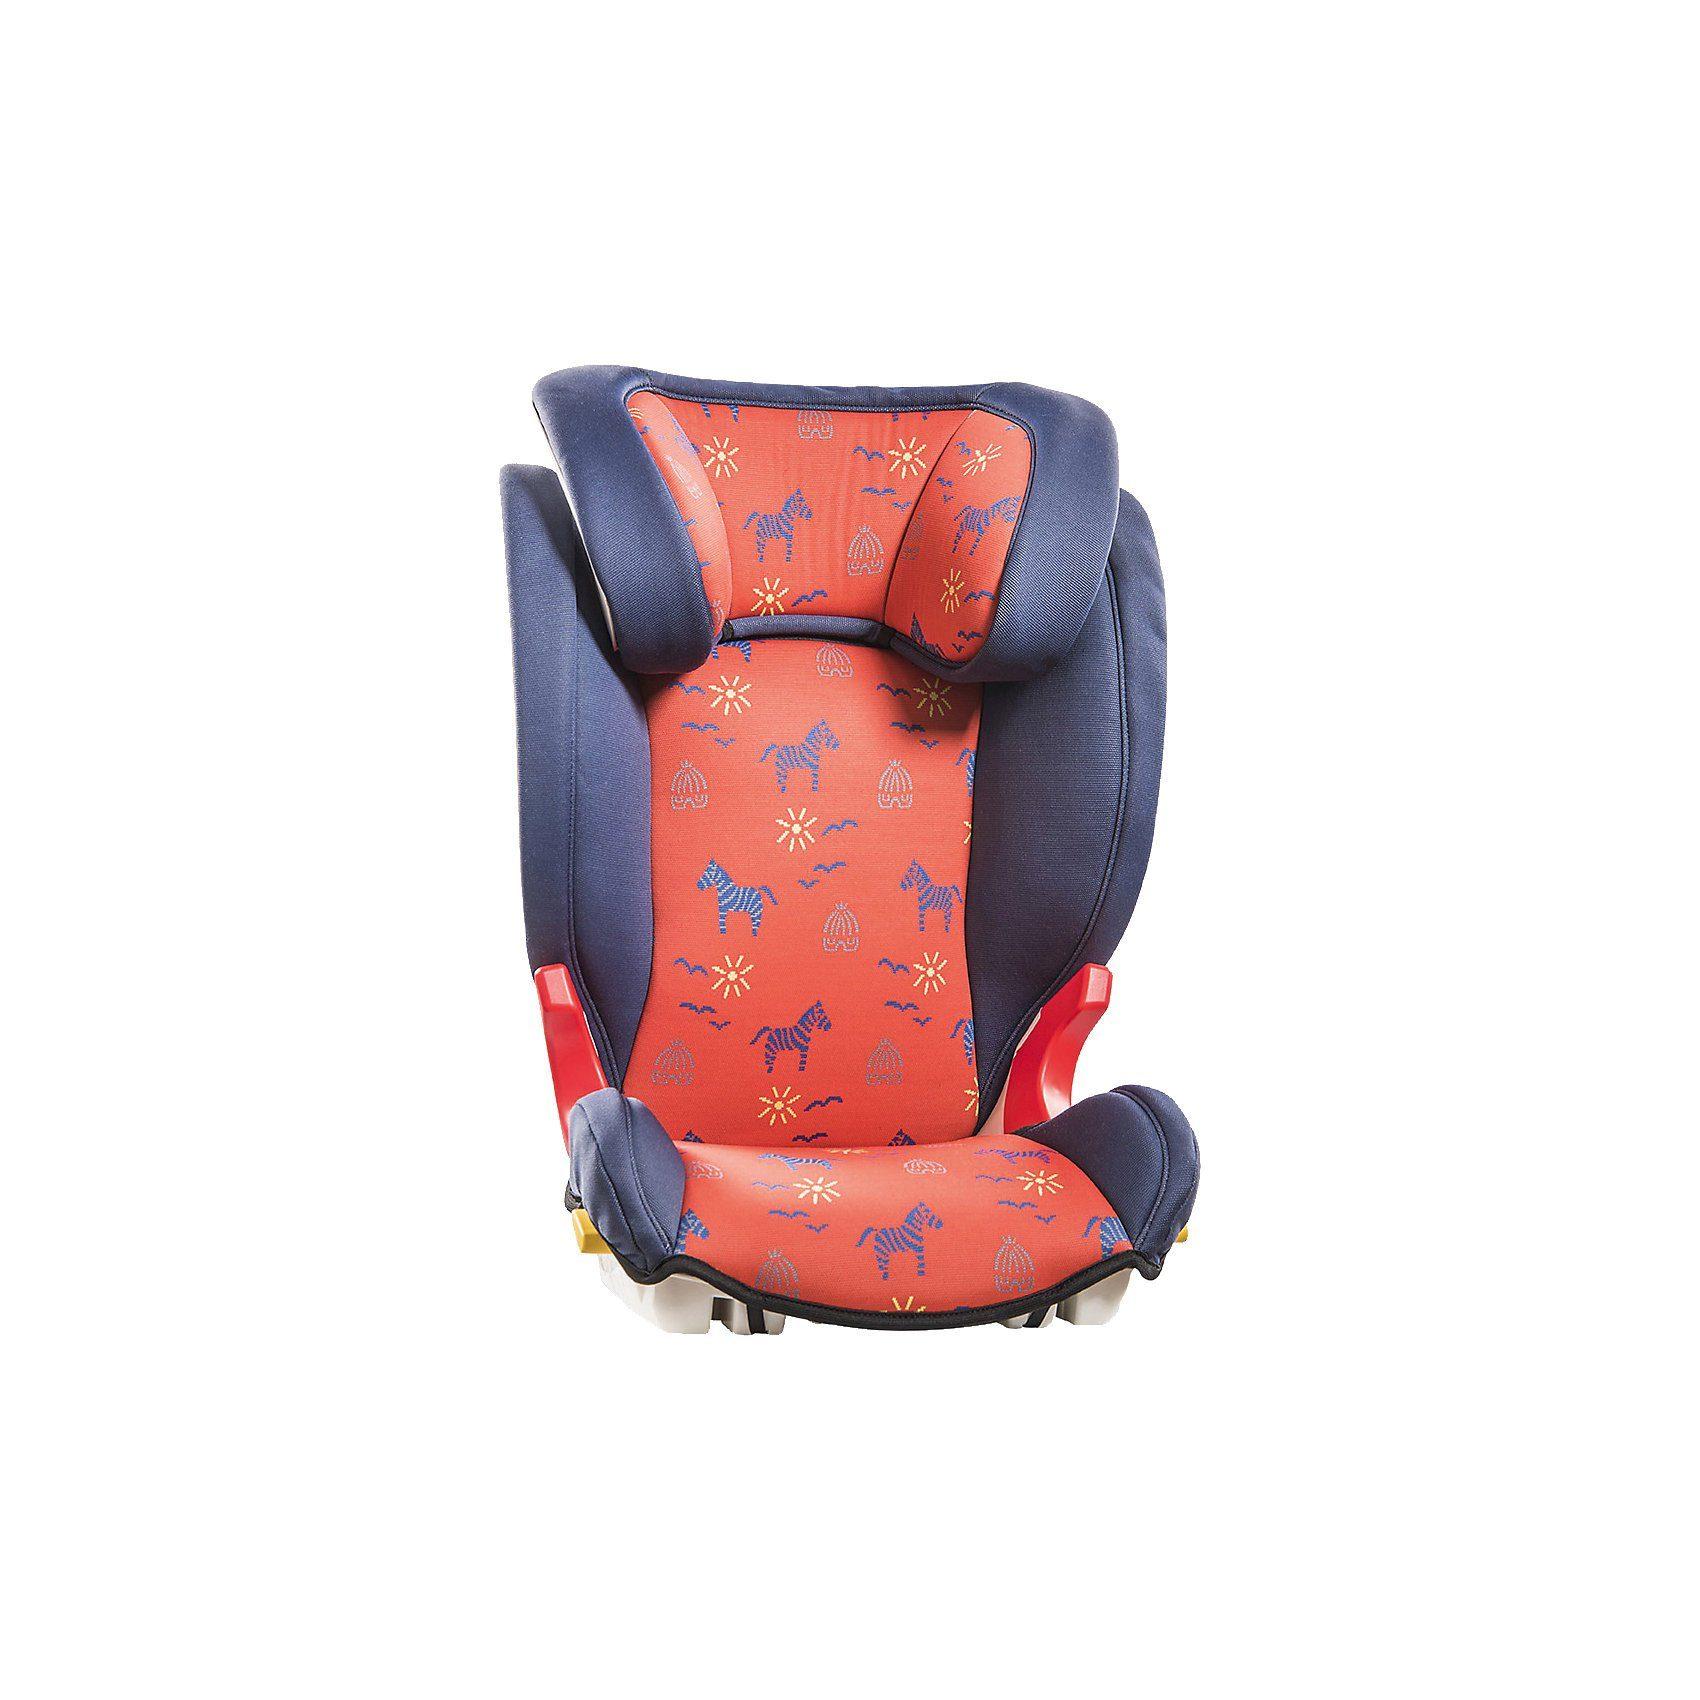 Baier Kindersitz Auto-Kindersitz Adefix, Family